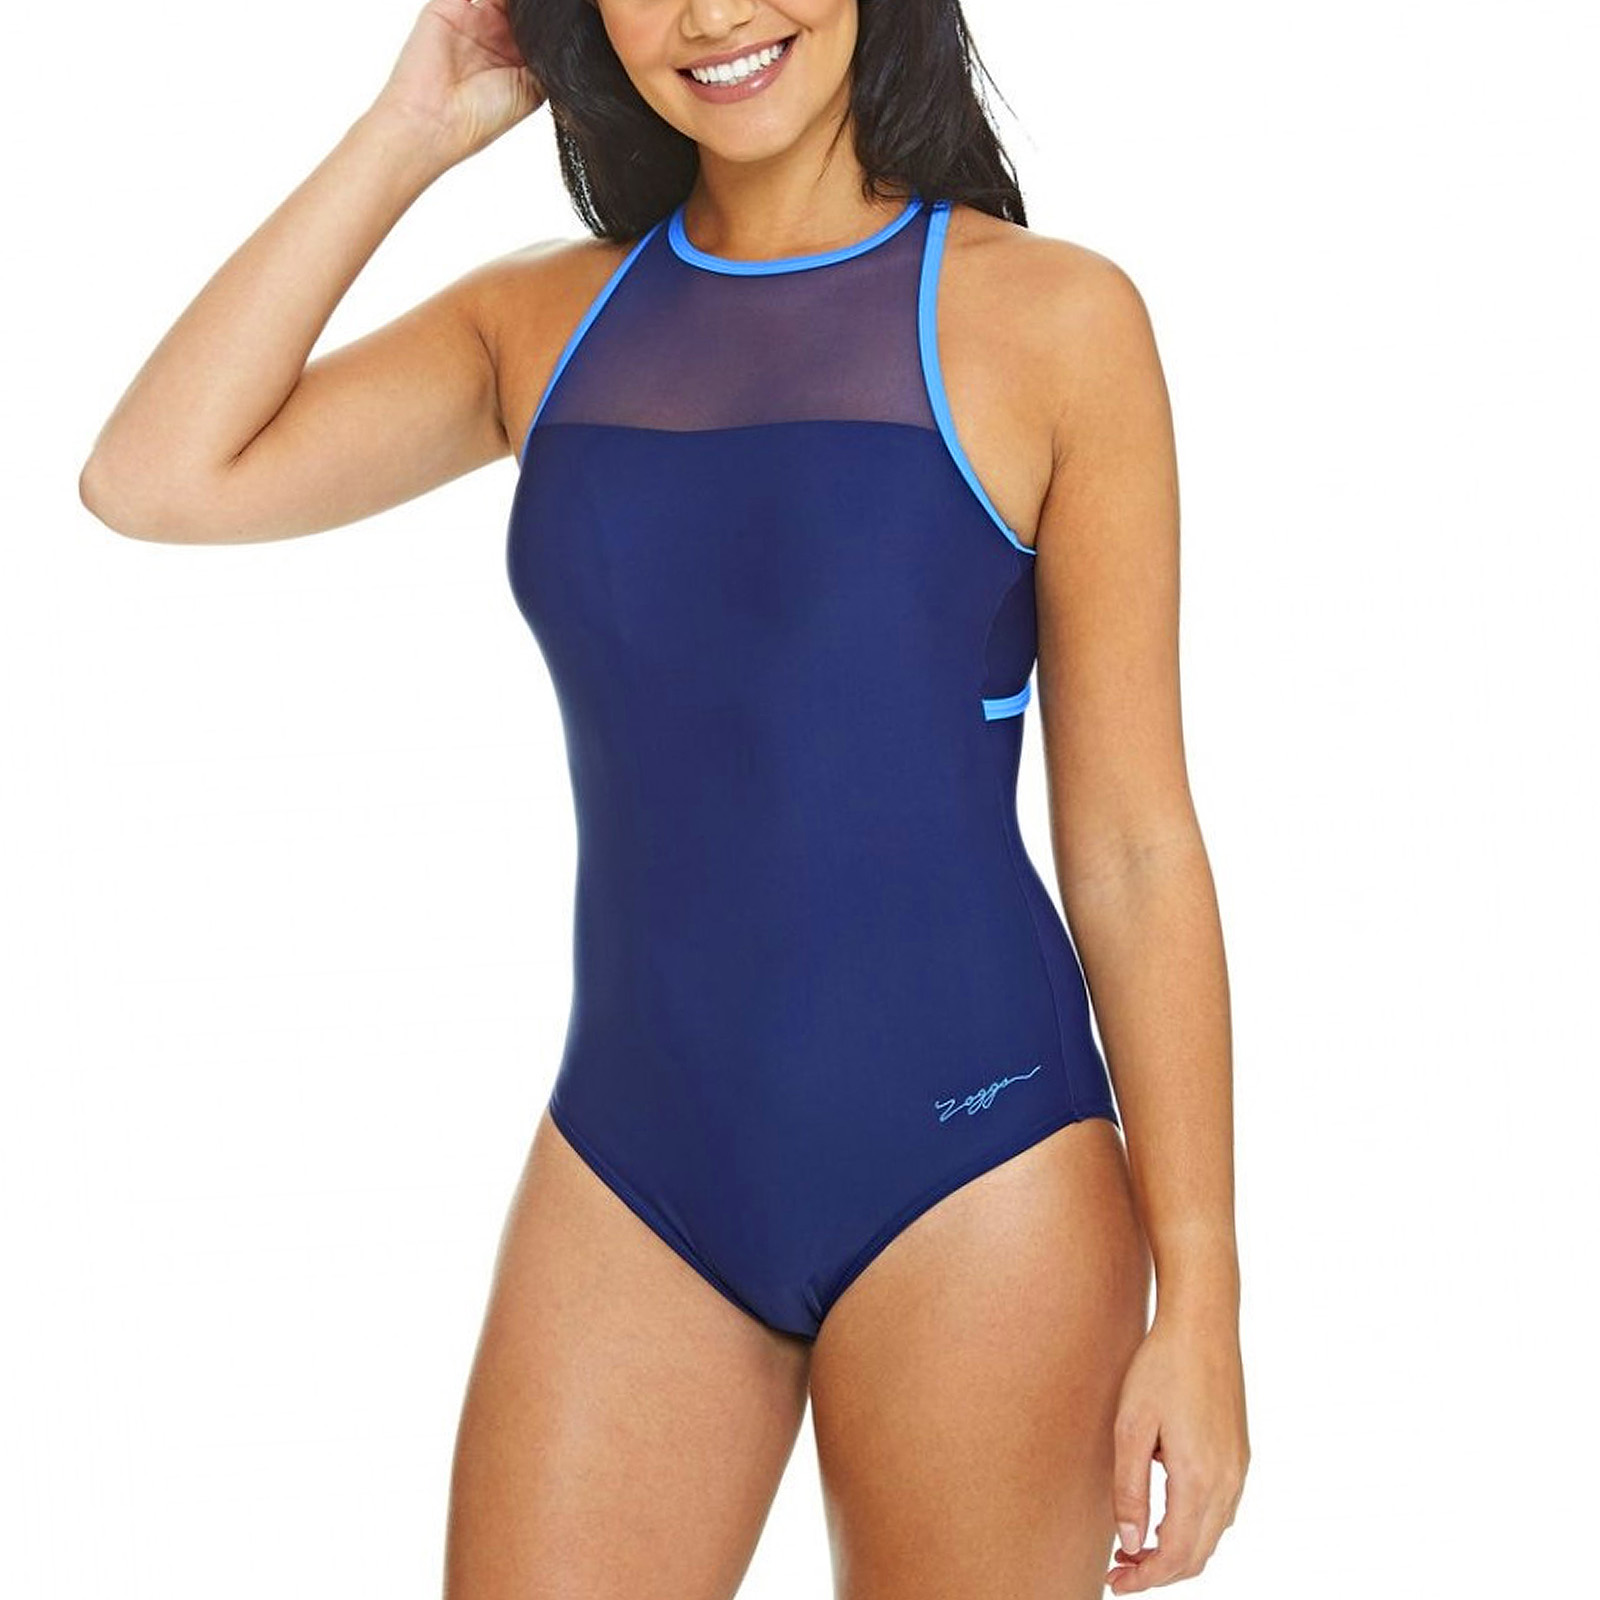 Black Zoggs Womens Merengo Mesh Clip Back Swimming Swim Pool Swimsuit Costume